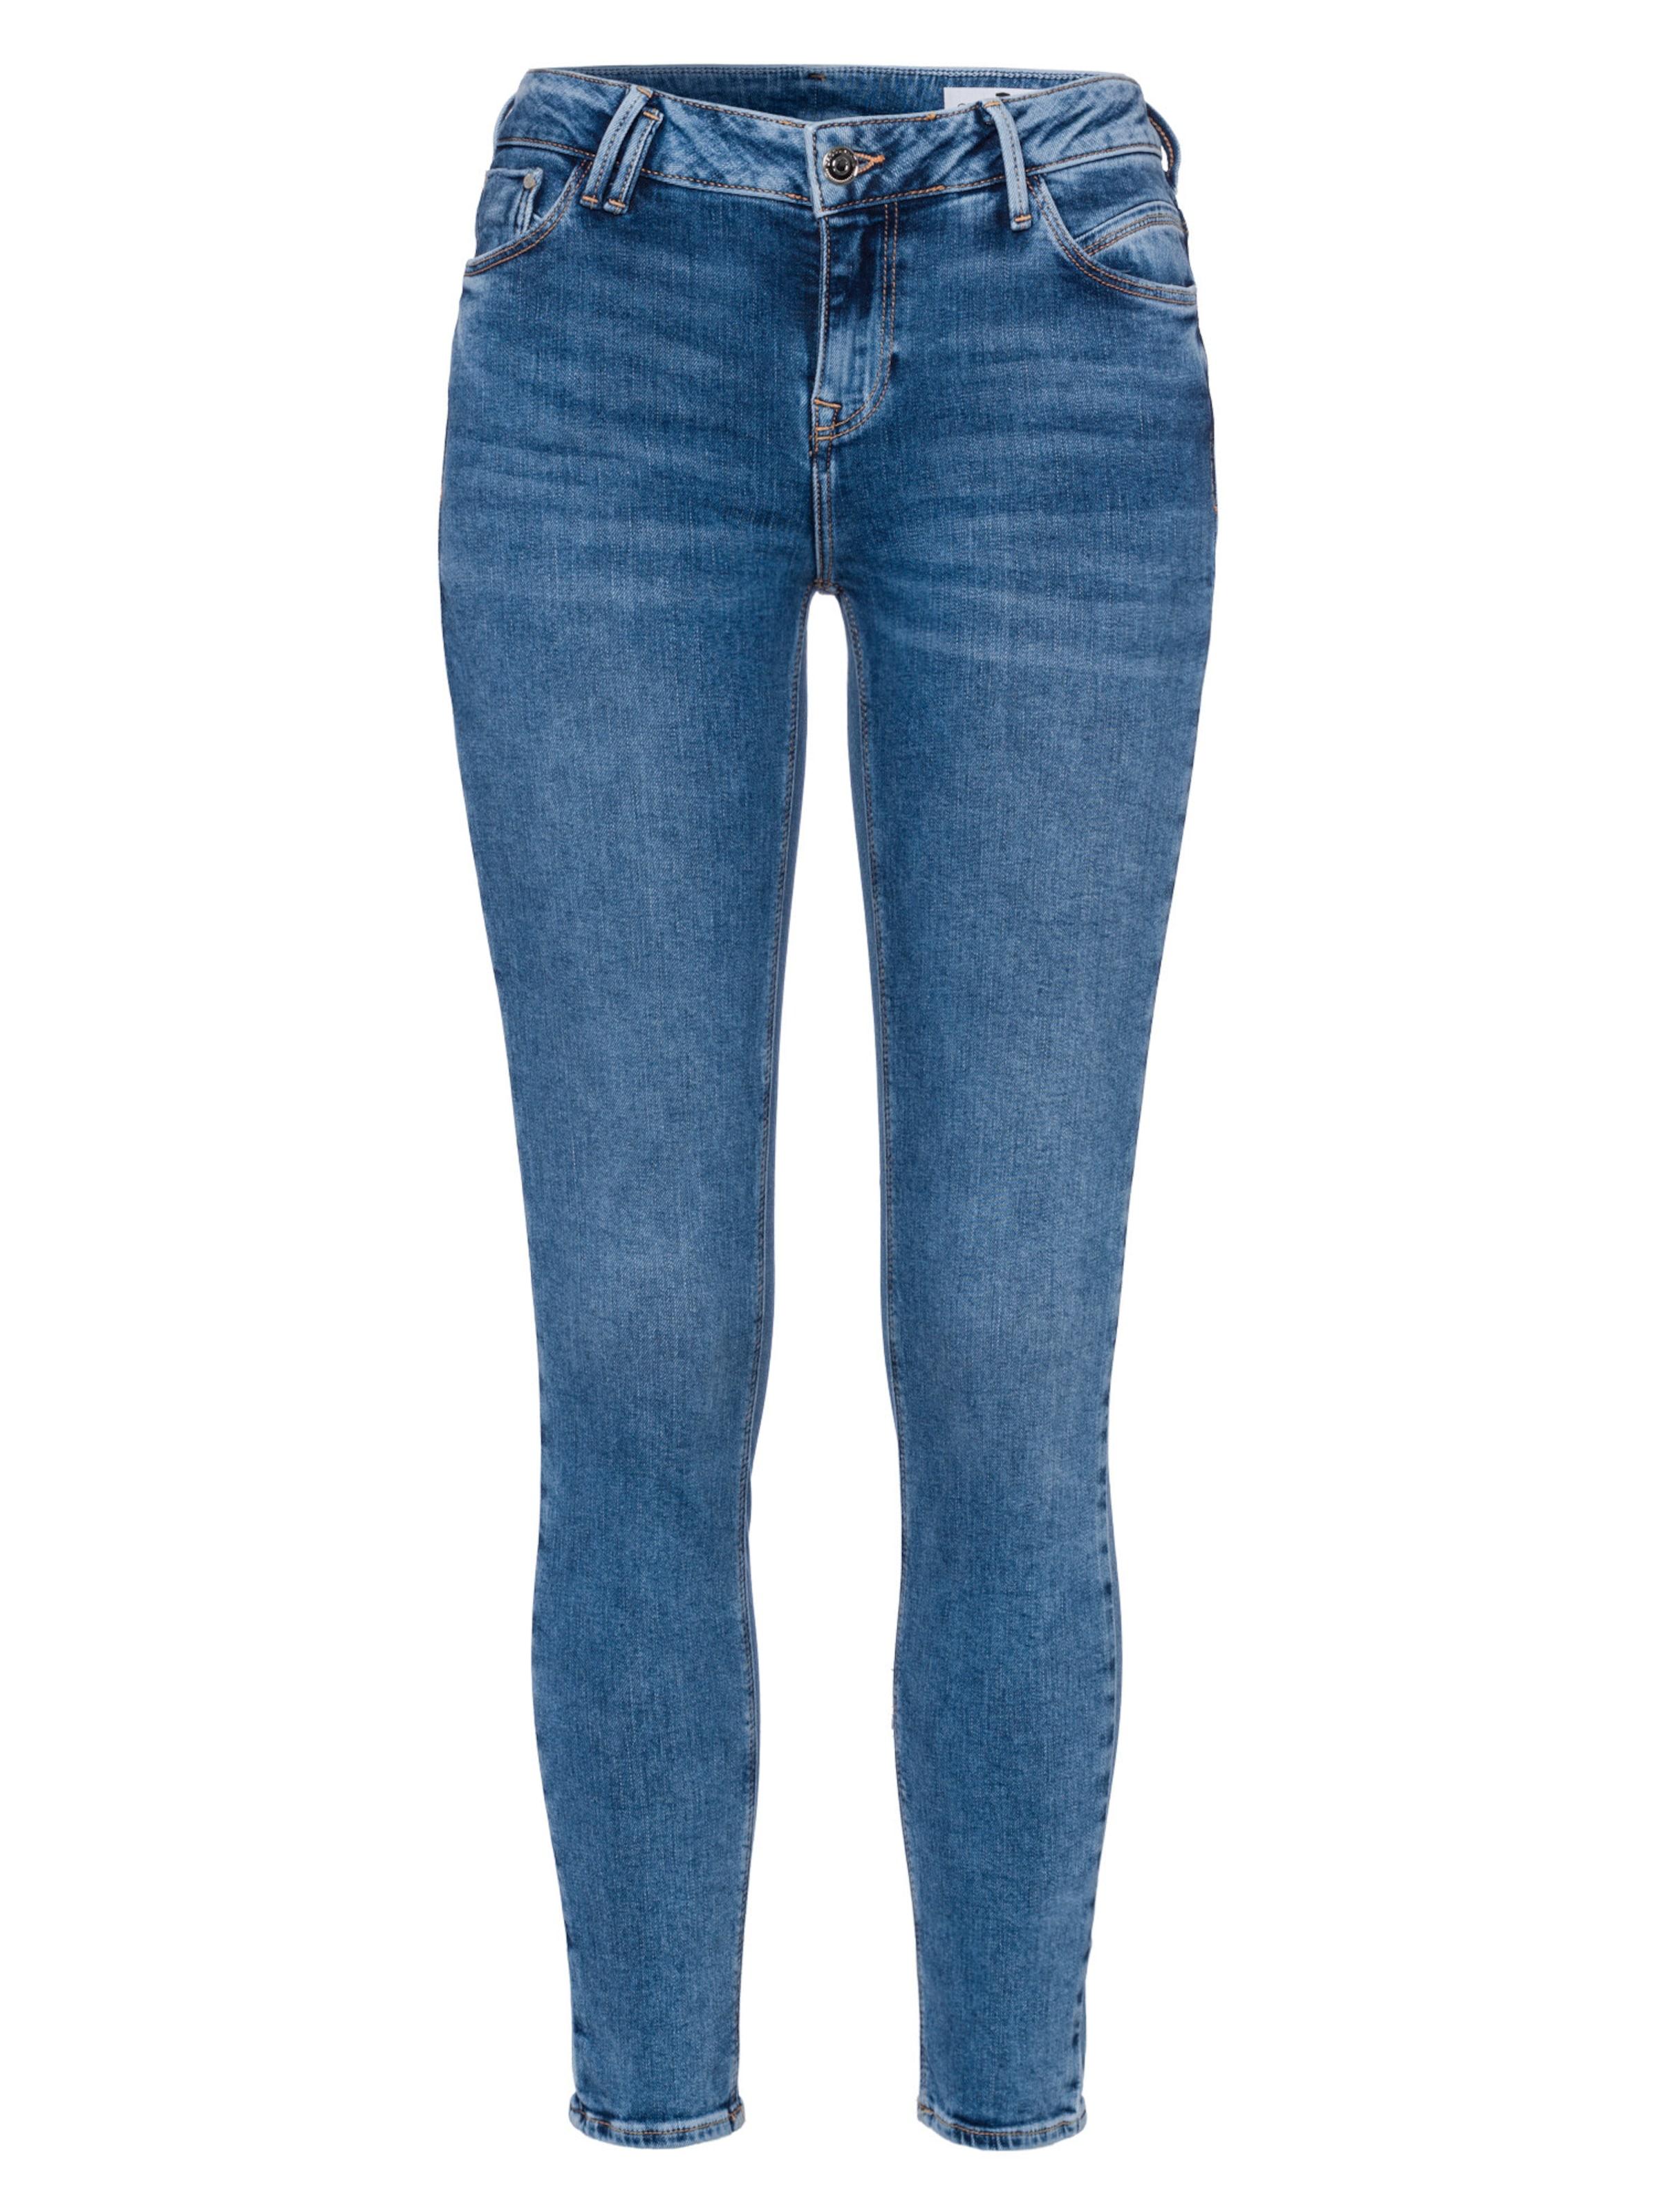 Cross 'giselle' Jeans Blue Denim In Nnw8vm0